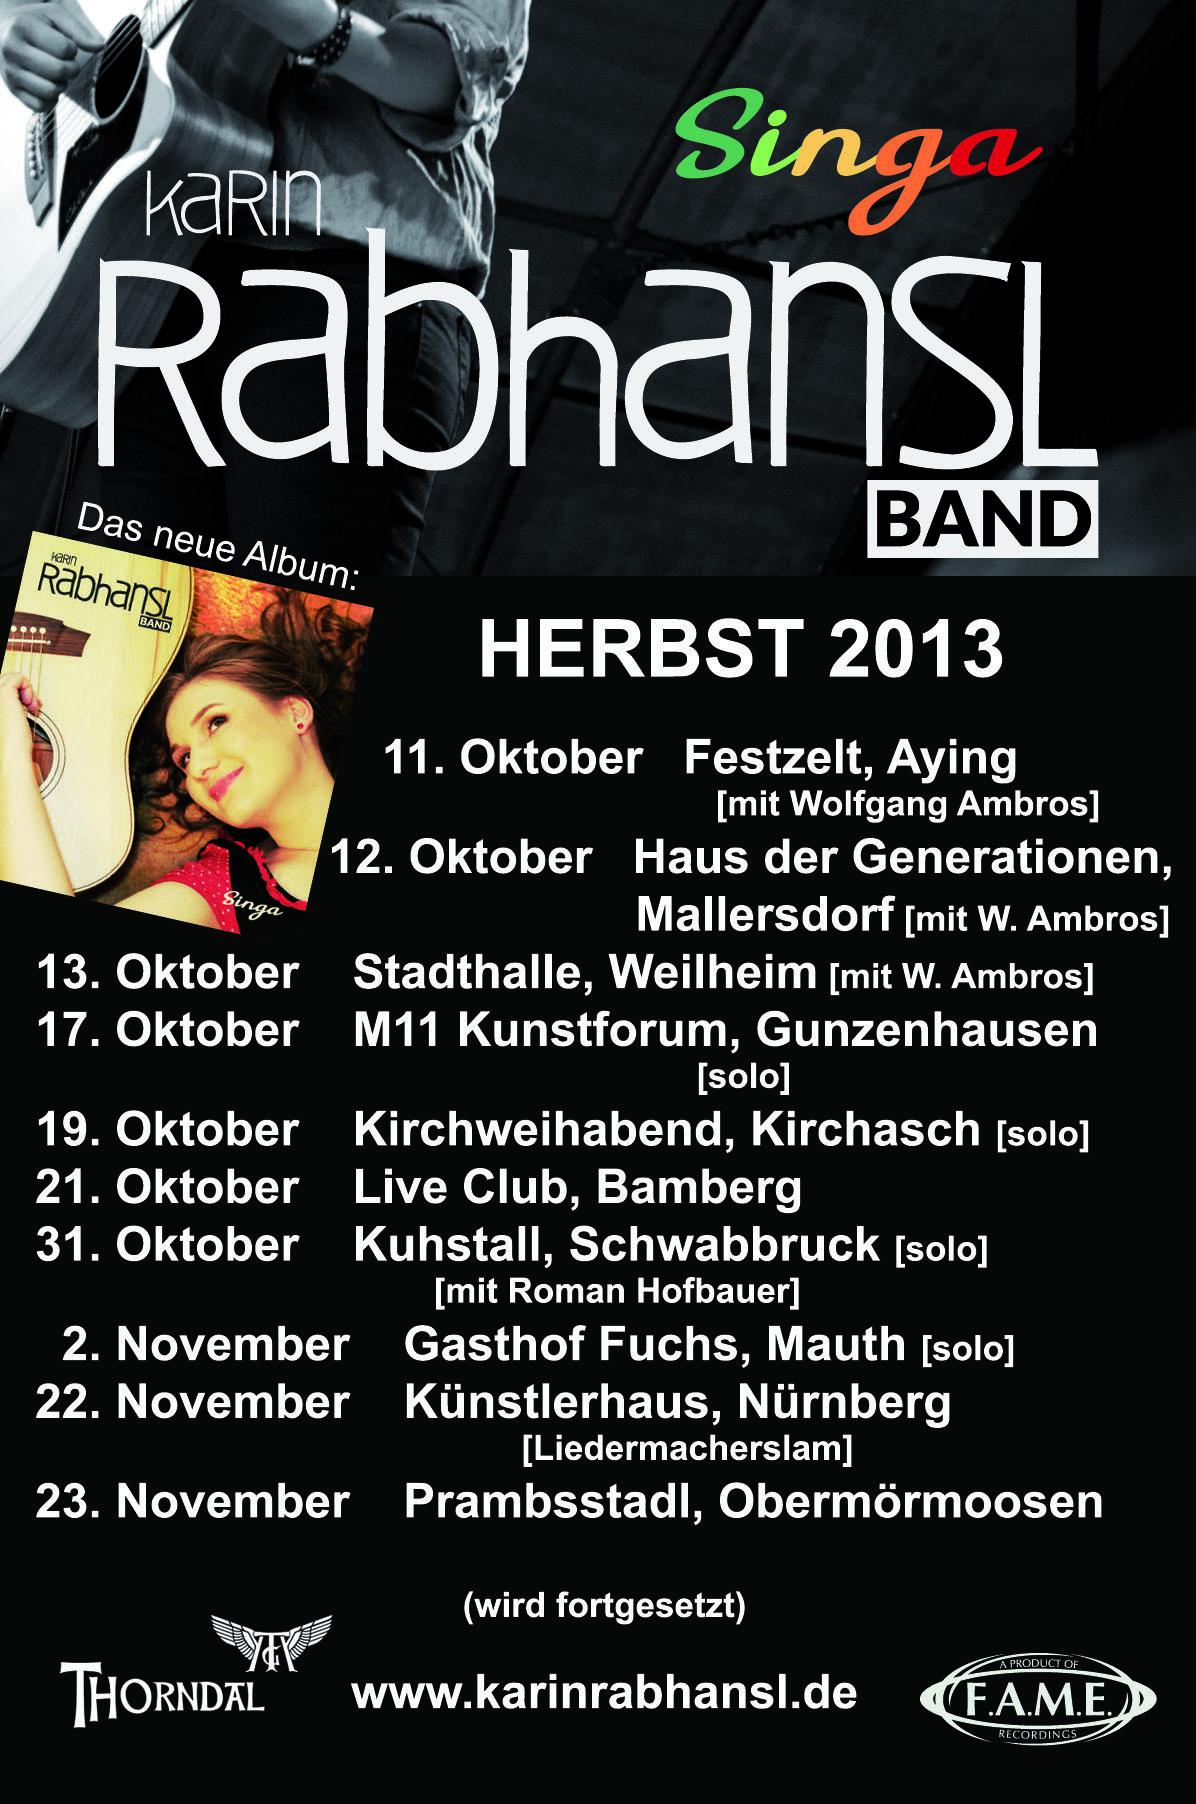 KarinRabhanslBand_tour2013_aktuell_Herbst2013